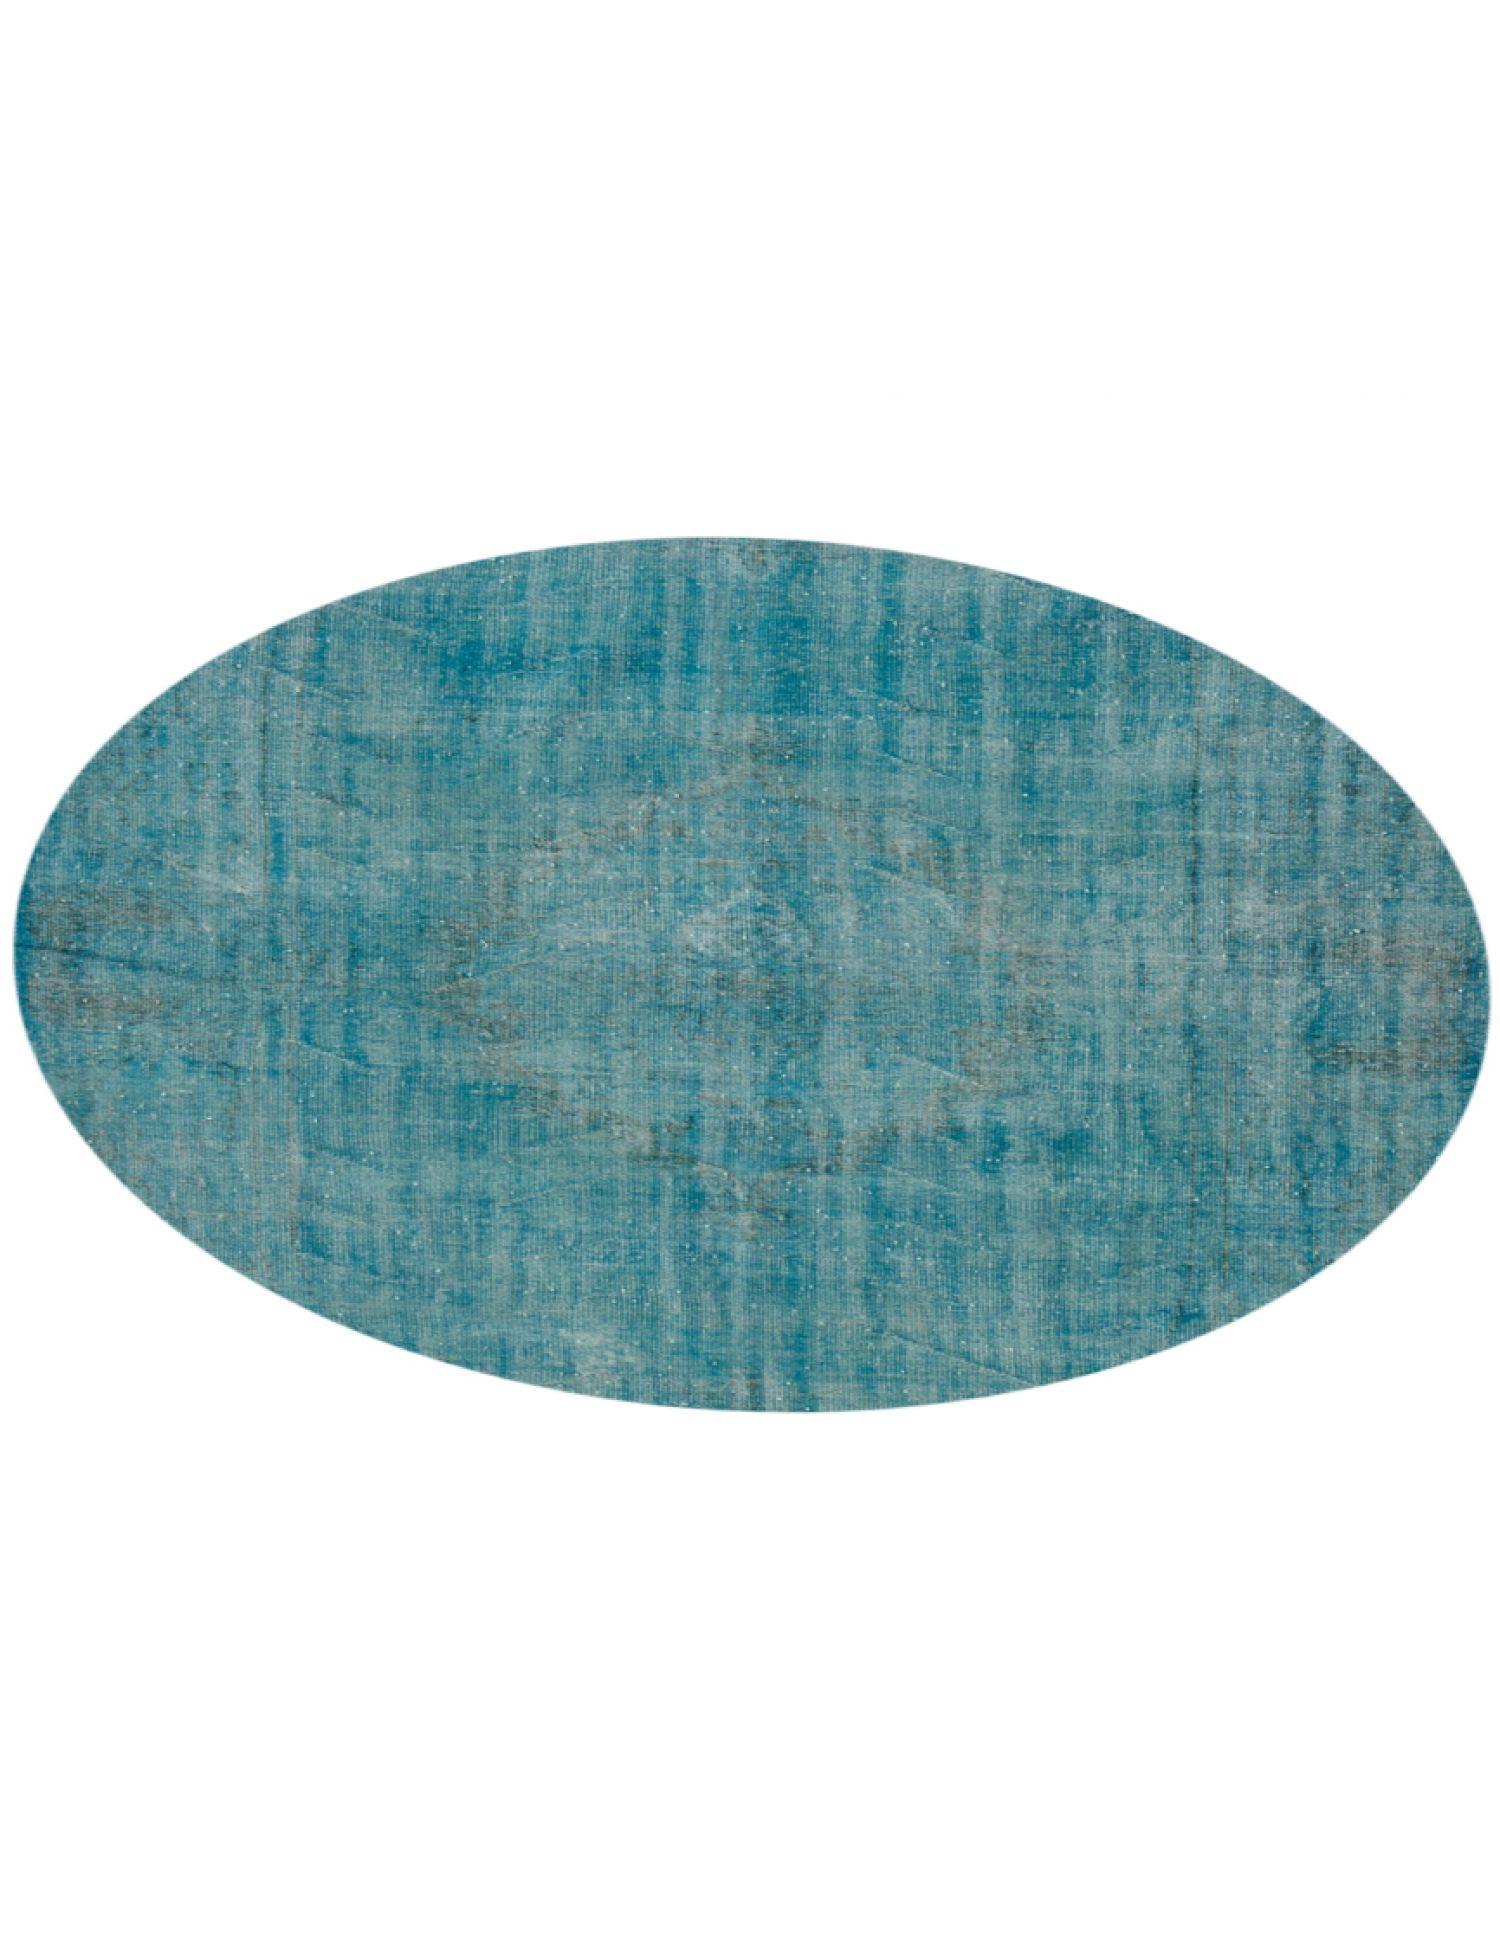 Tappeto Vintage  blu <br/>242 x 242 cm